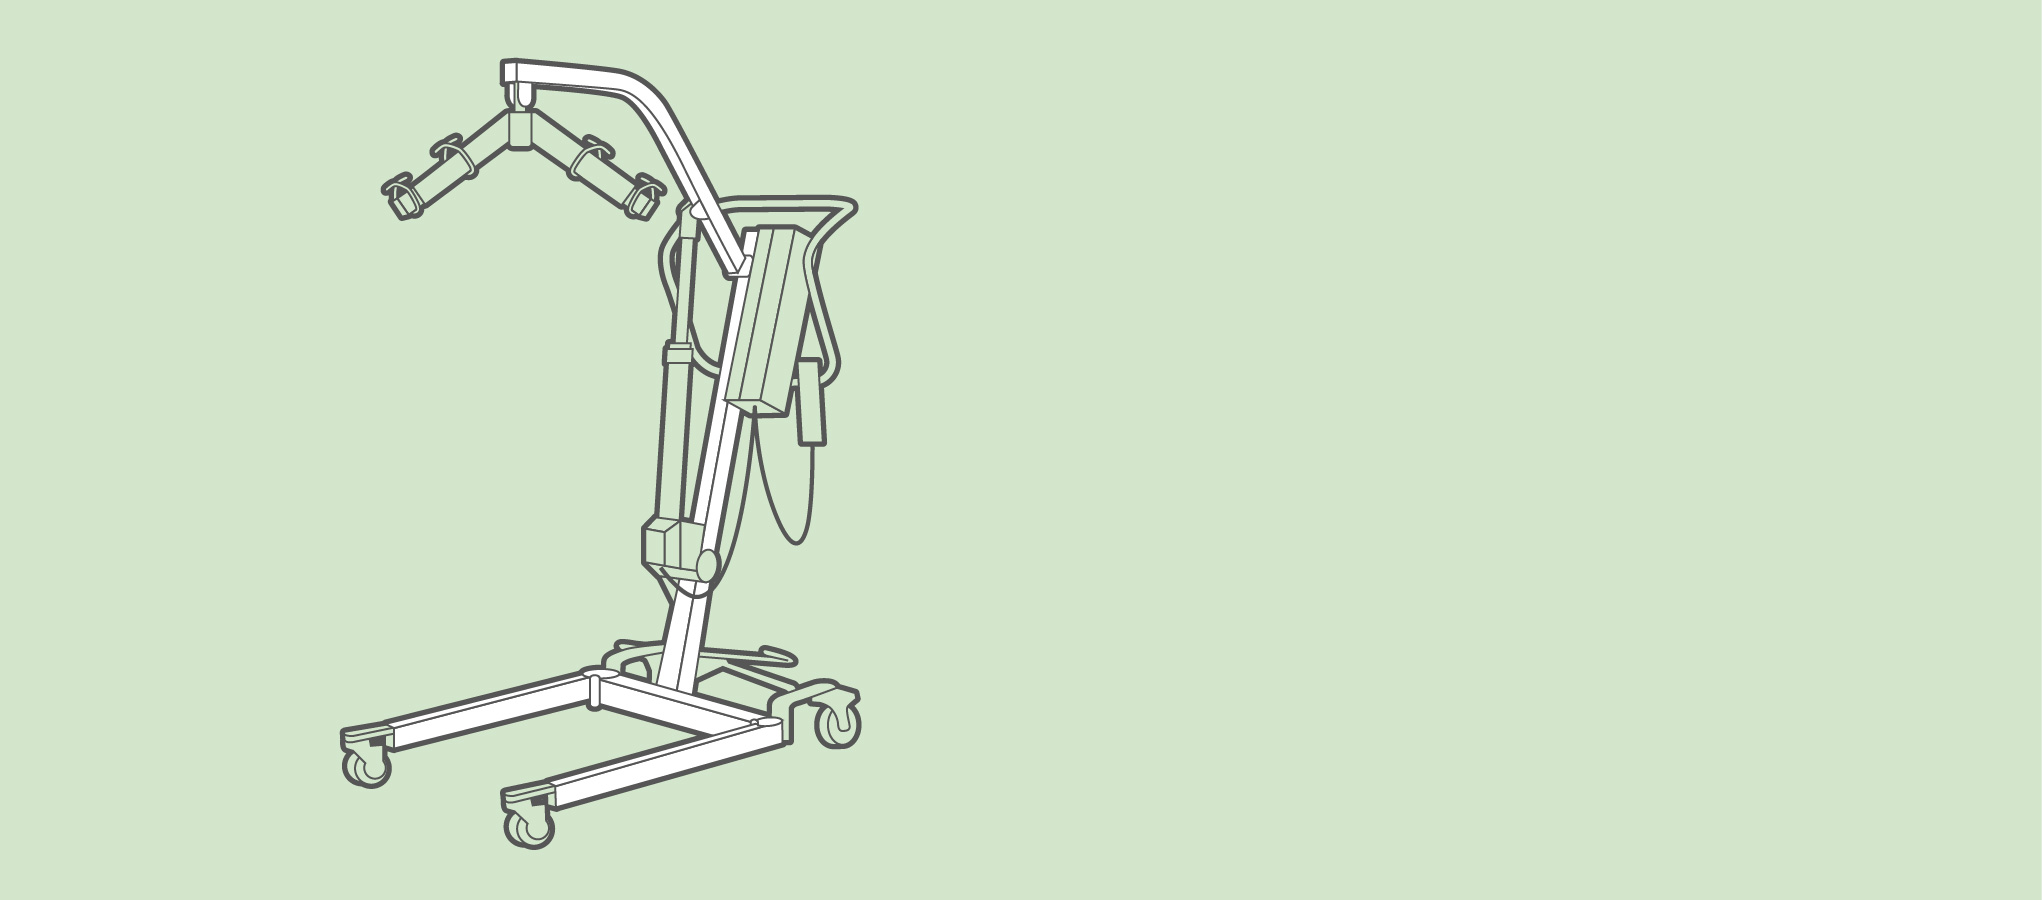 patientenlifter personenlifter zum umsetzen. Black Bedroom Furniture Sets. Home Design Ideas